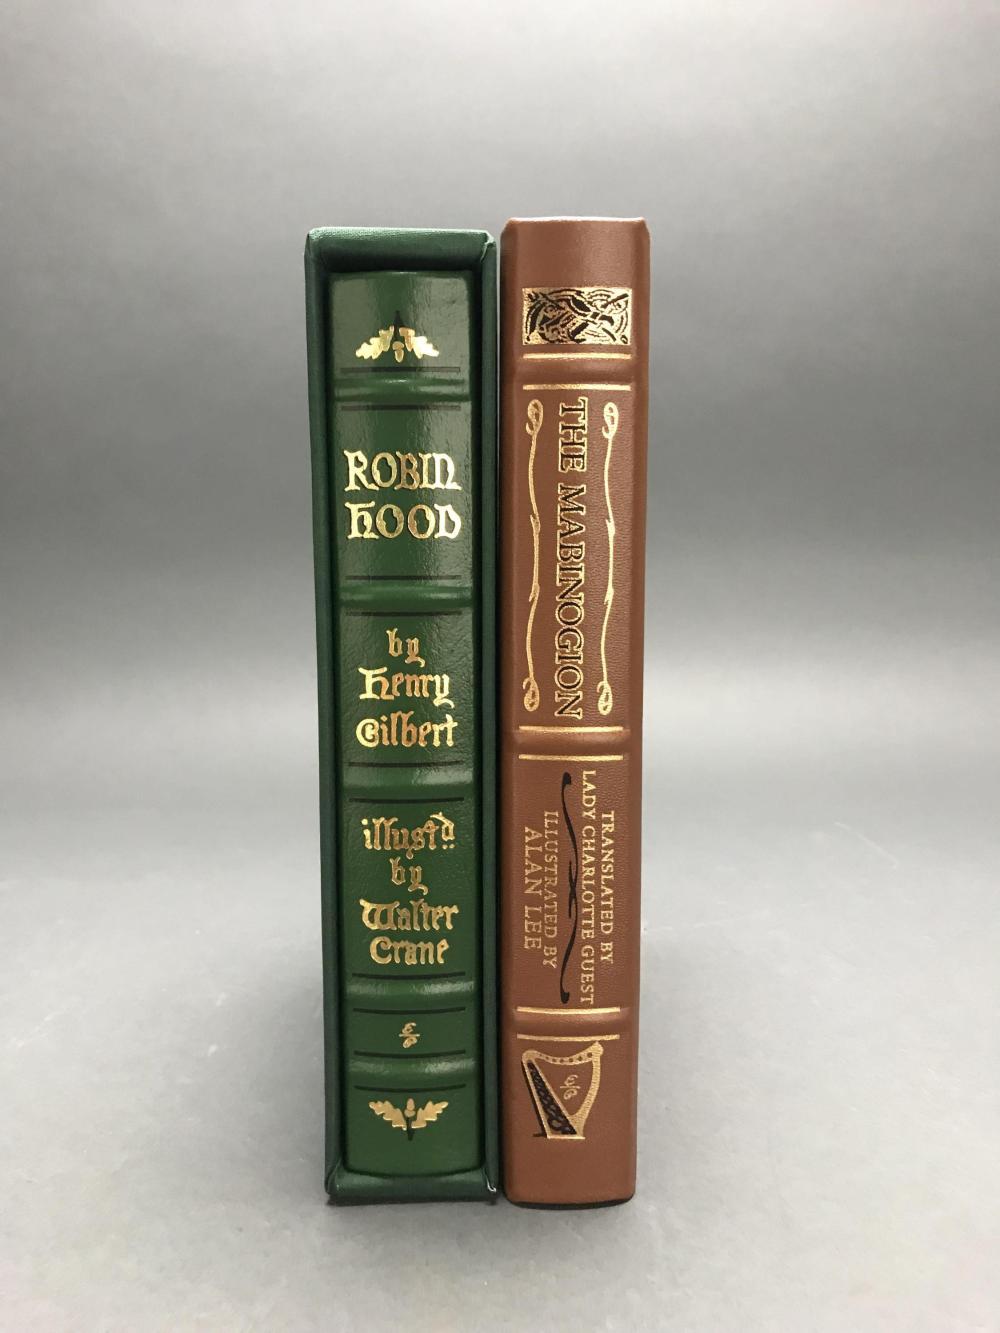 2 vols. Easton. Incl: Robin Hood, Mabinogion.